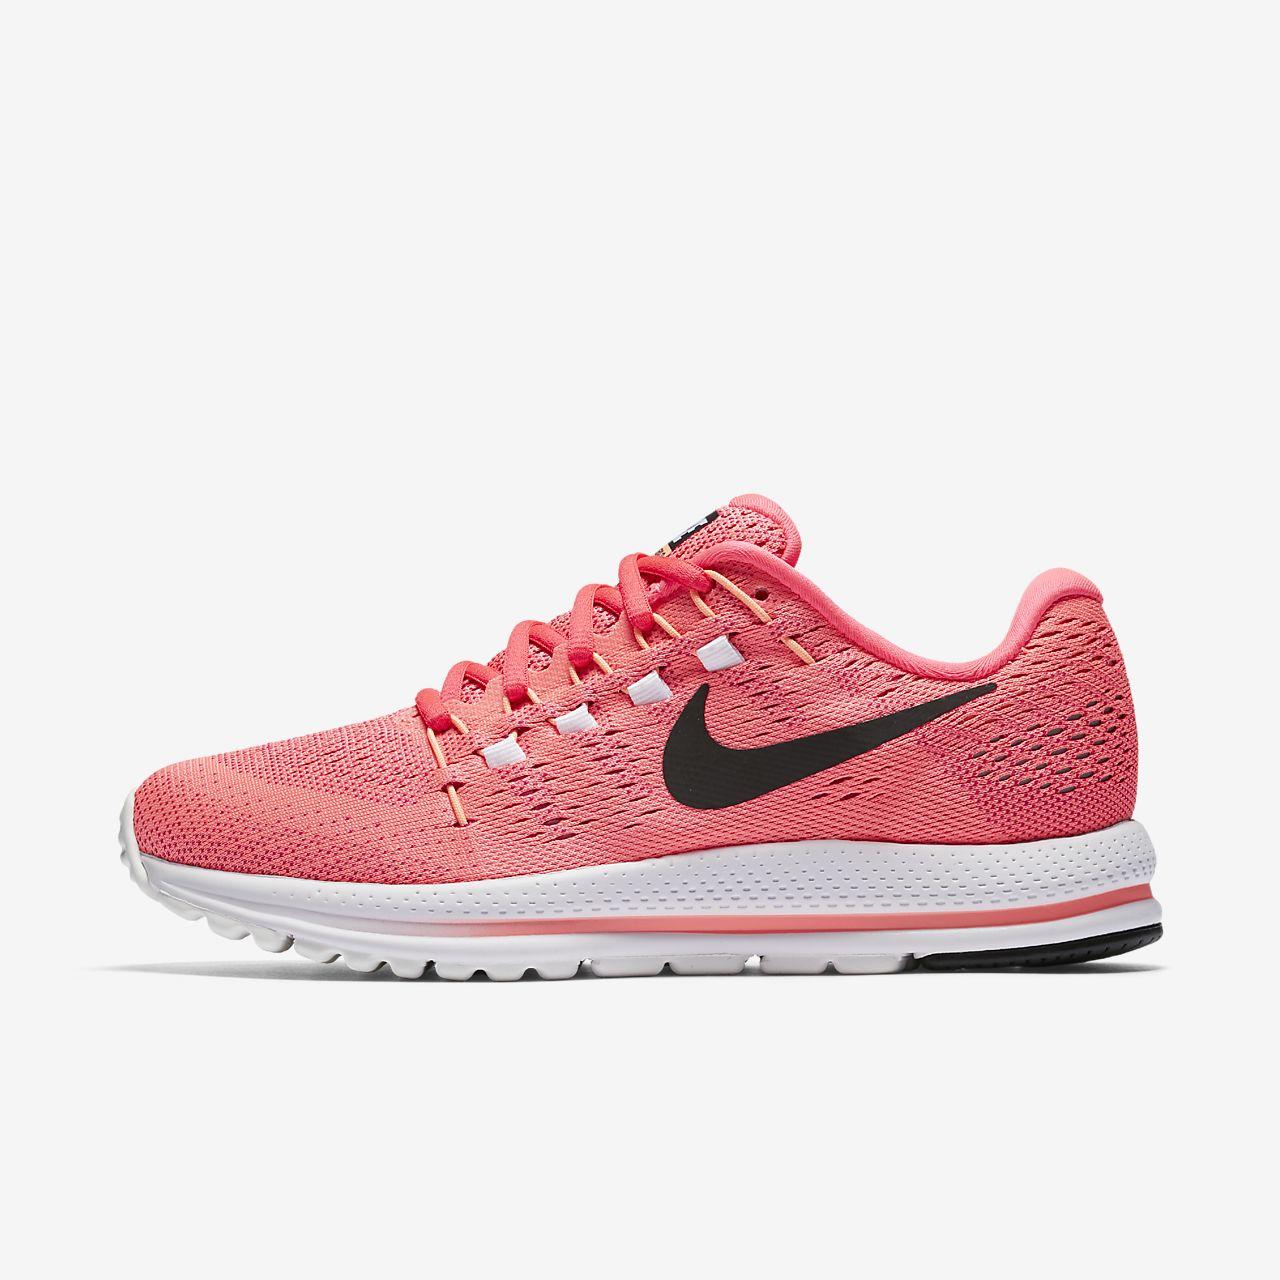 ... Nike Air Zoom Vomero 12 løpesko for dame